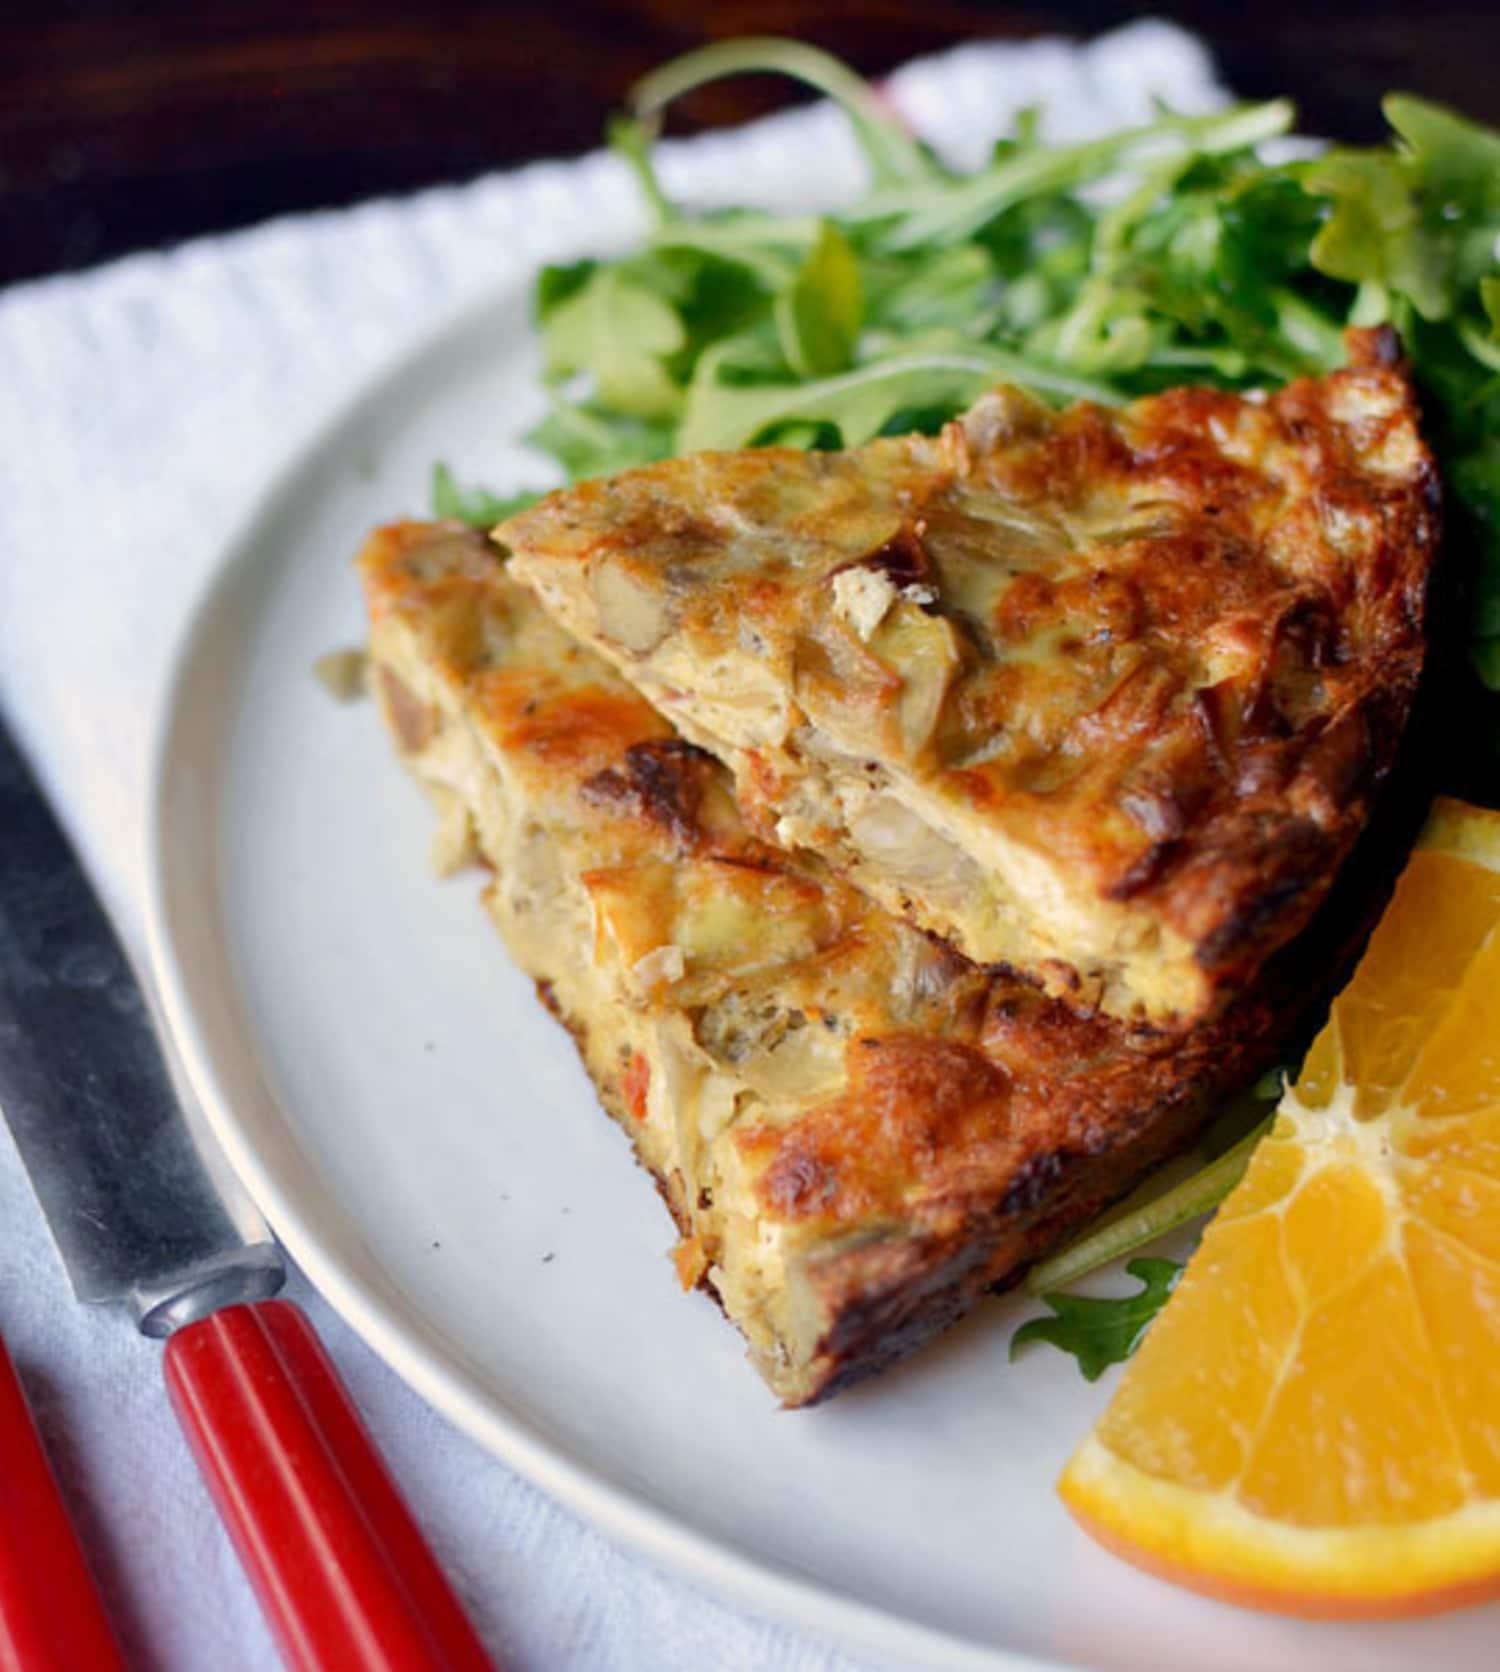 Make-Ahead Recipe: Sausage, Artichoke & Goat Cheese Egg Bake